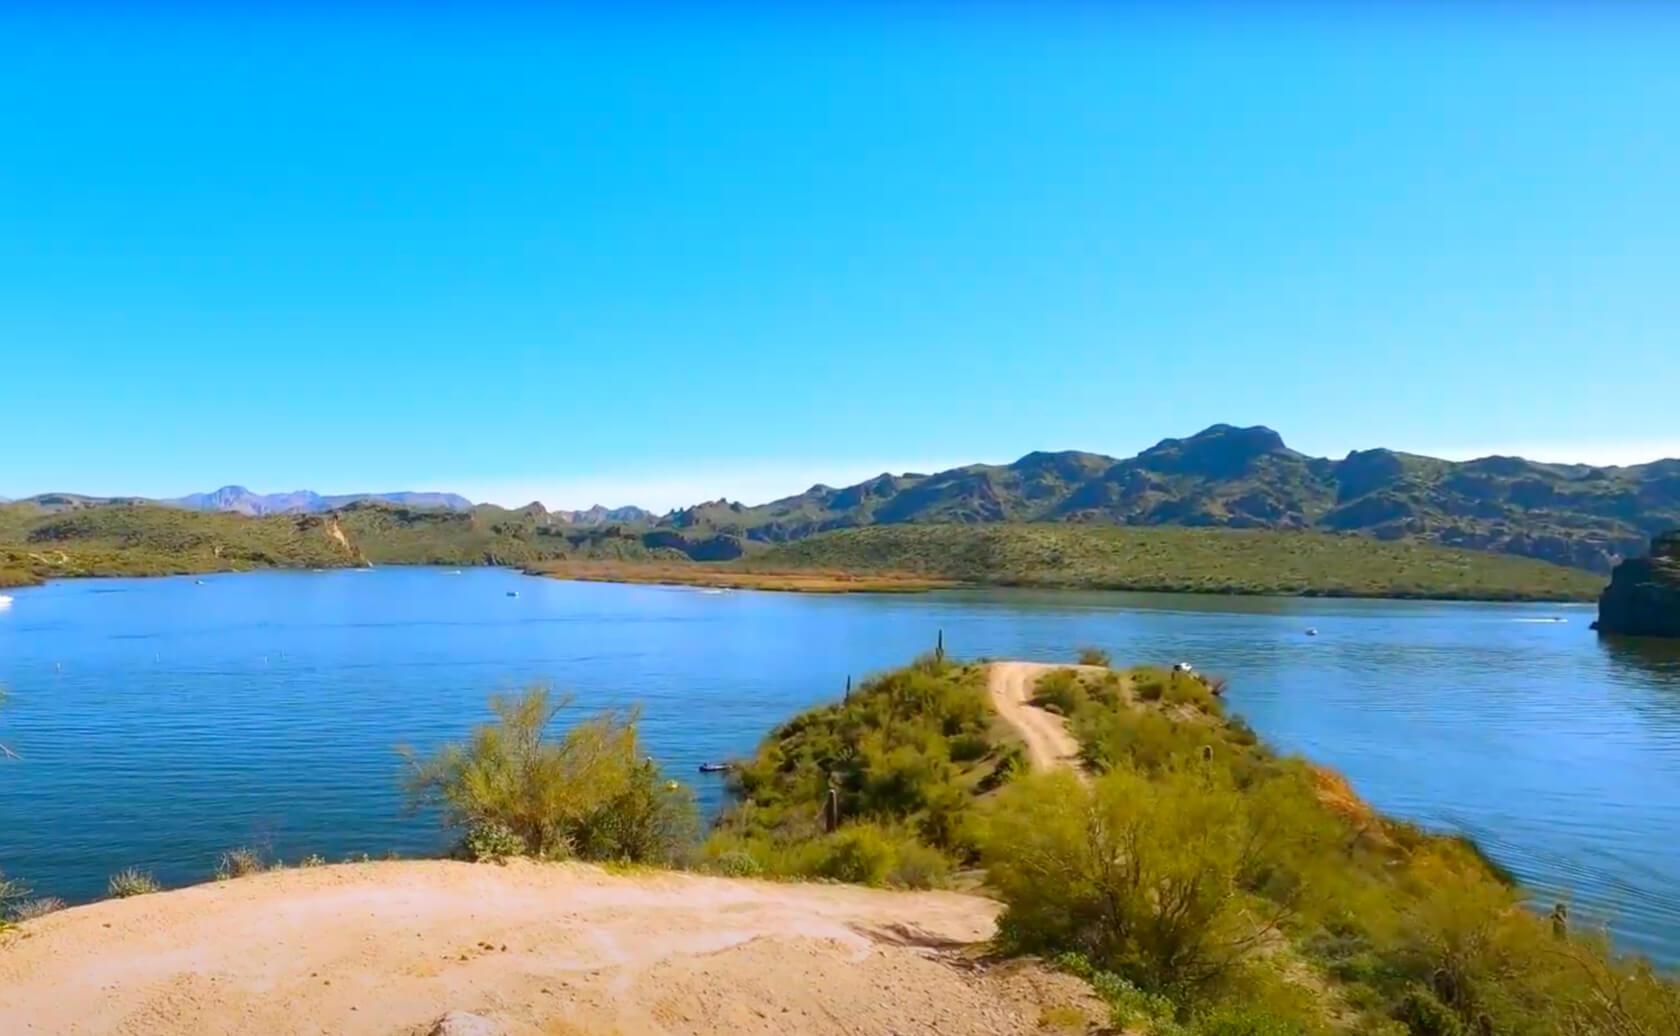 saguaro-lake-fishing-guide-report-az-03